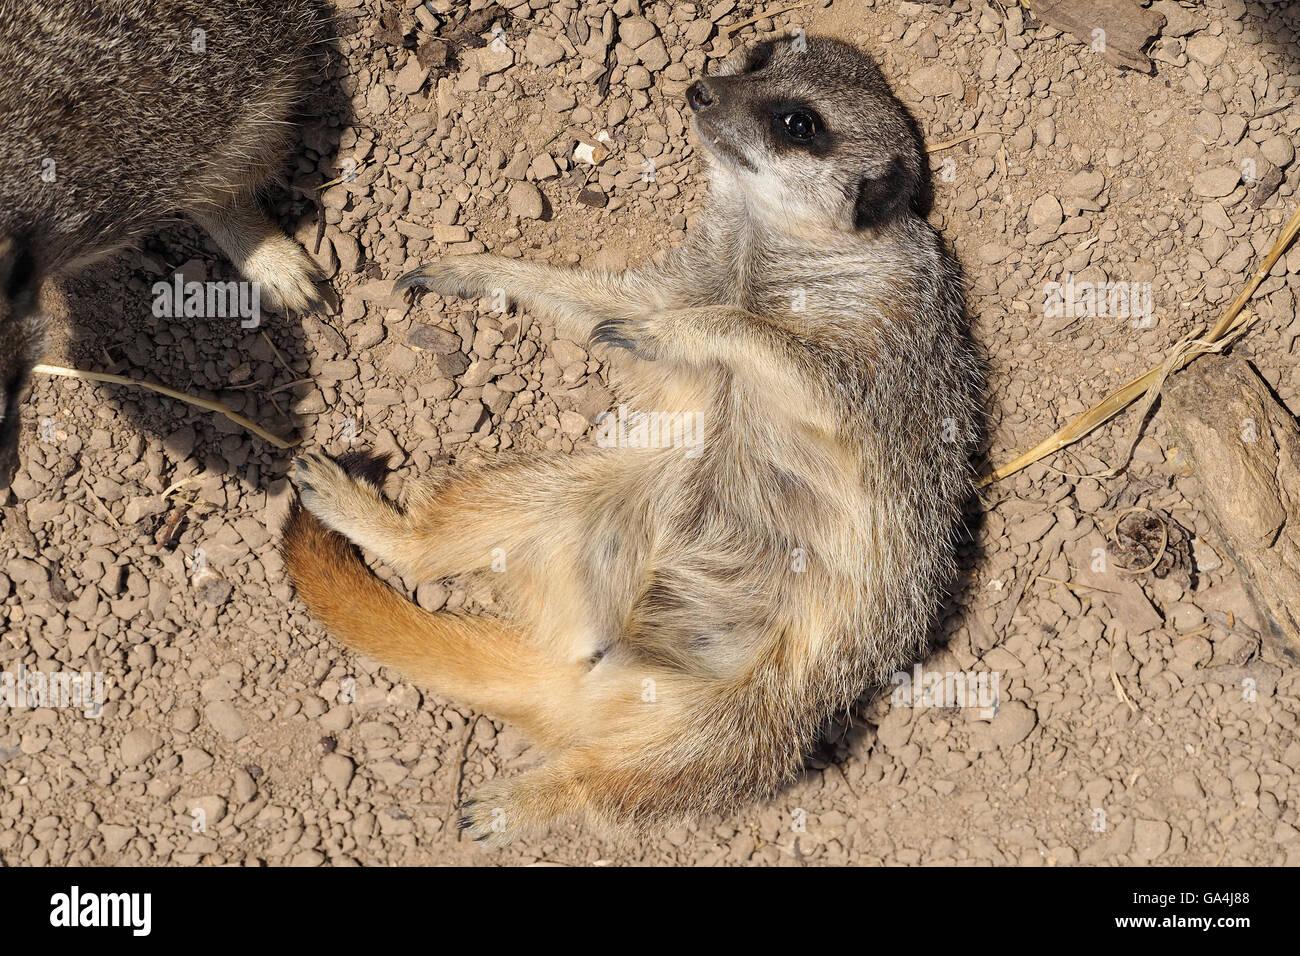 Meerkat lying on ground - Stock Image